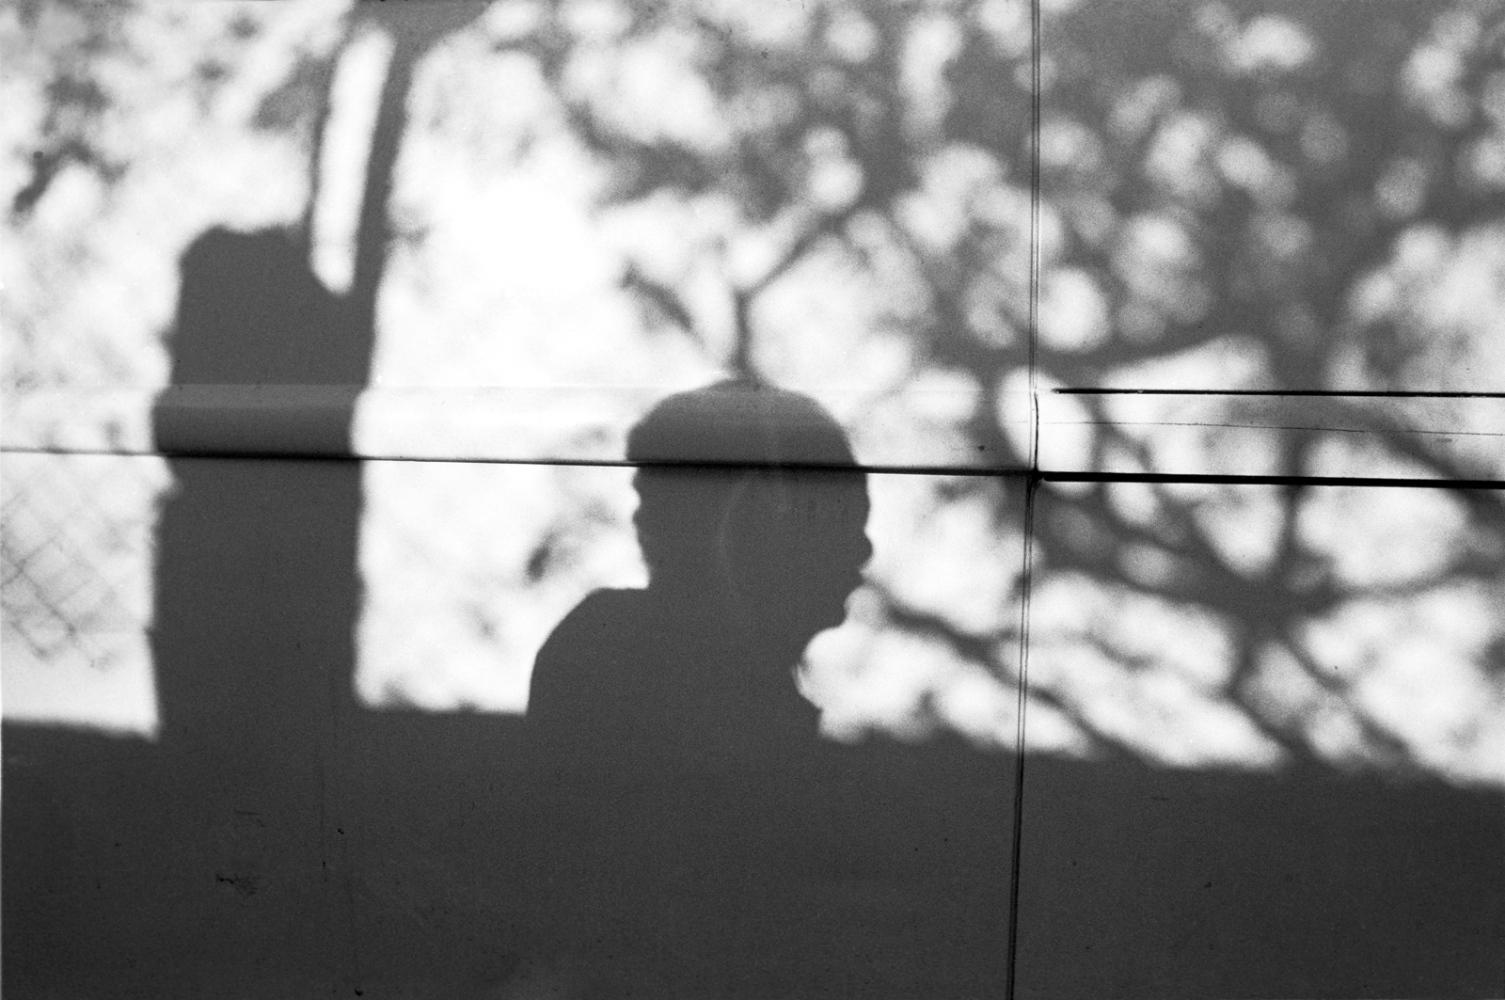 Art and Documentary Photography - Loading Bram_MexicoDF2010__sdeswaan.jpg